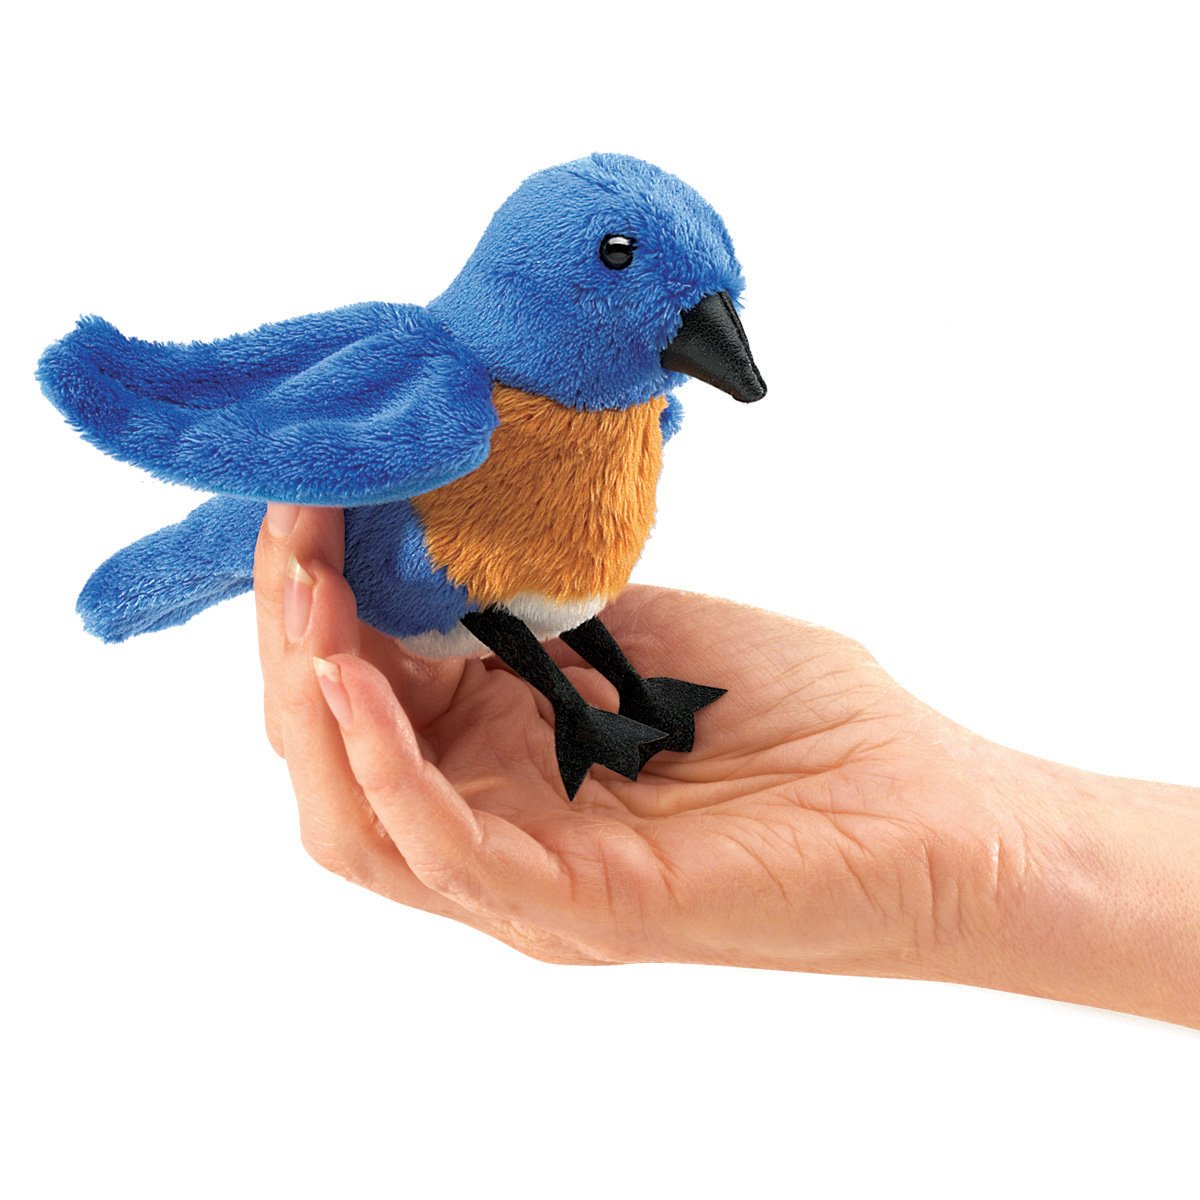 Folkmanis Mini Bluebird Finger Puppet Folkmanis Puppets 2755